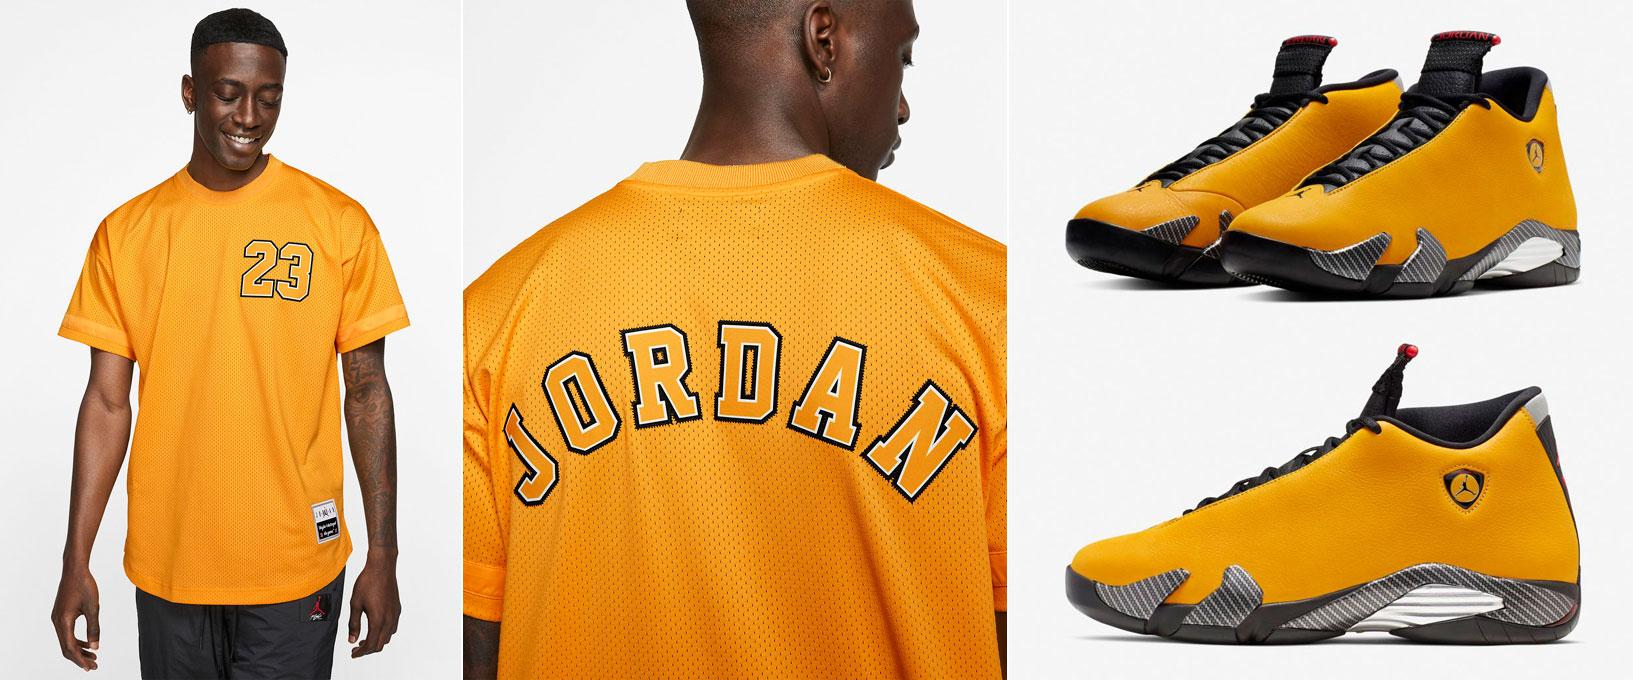 detailed look a42d3 887be Jordan 14 Yellow Reverse Ferrari Jersey | SneakerFits.com